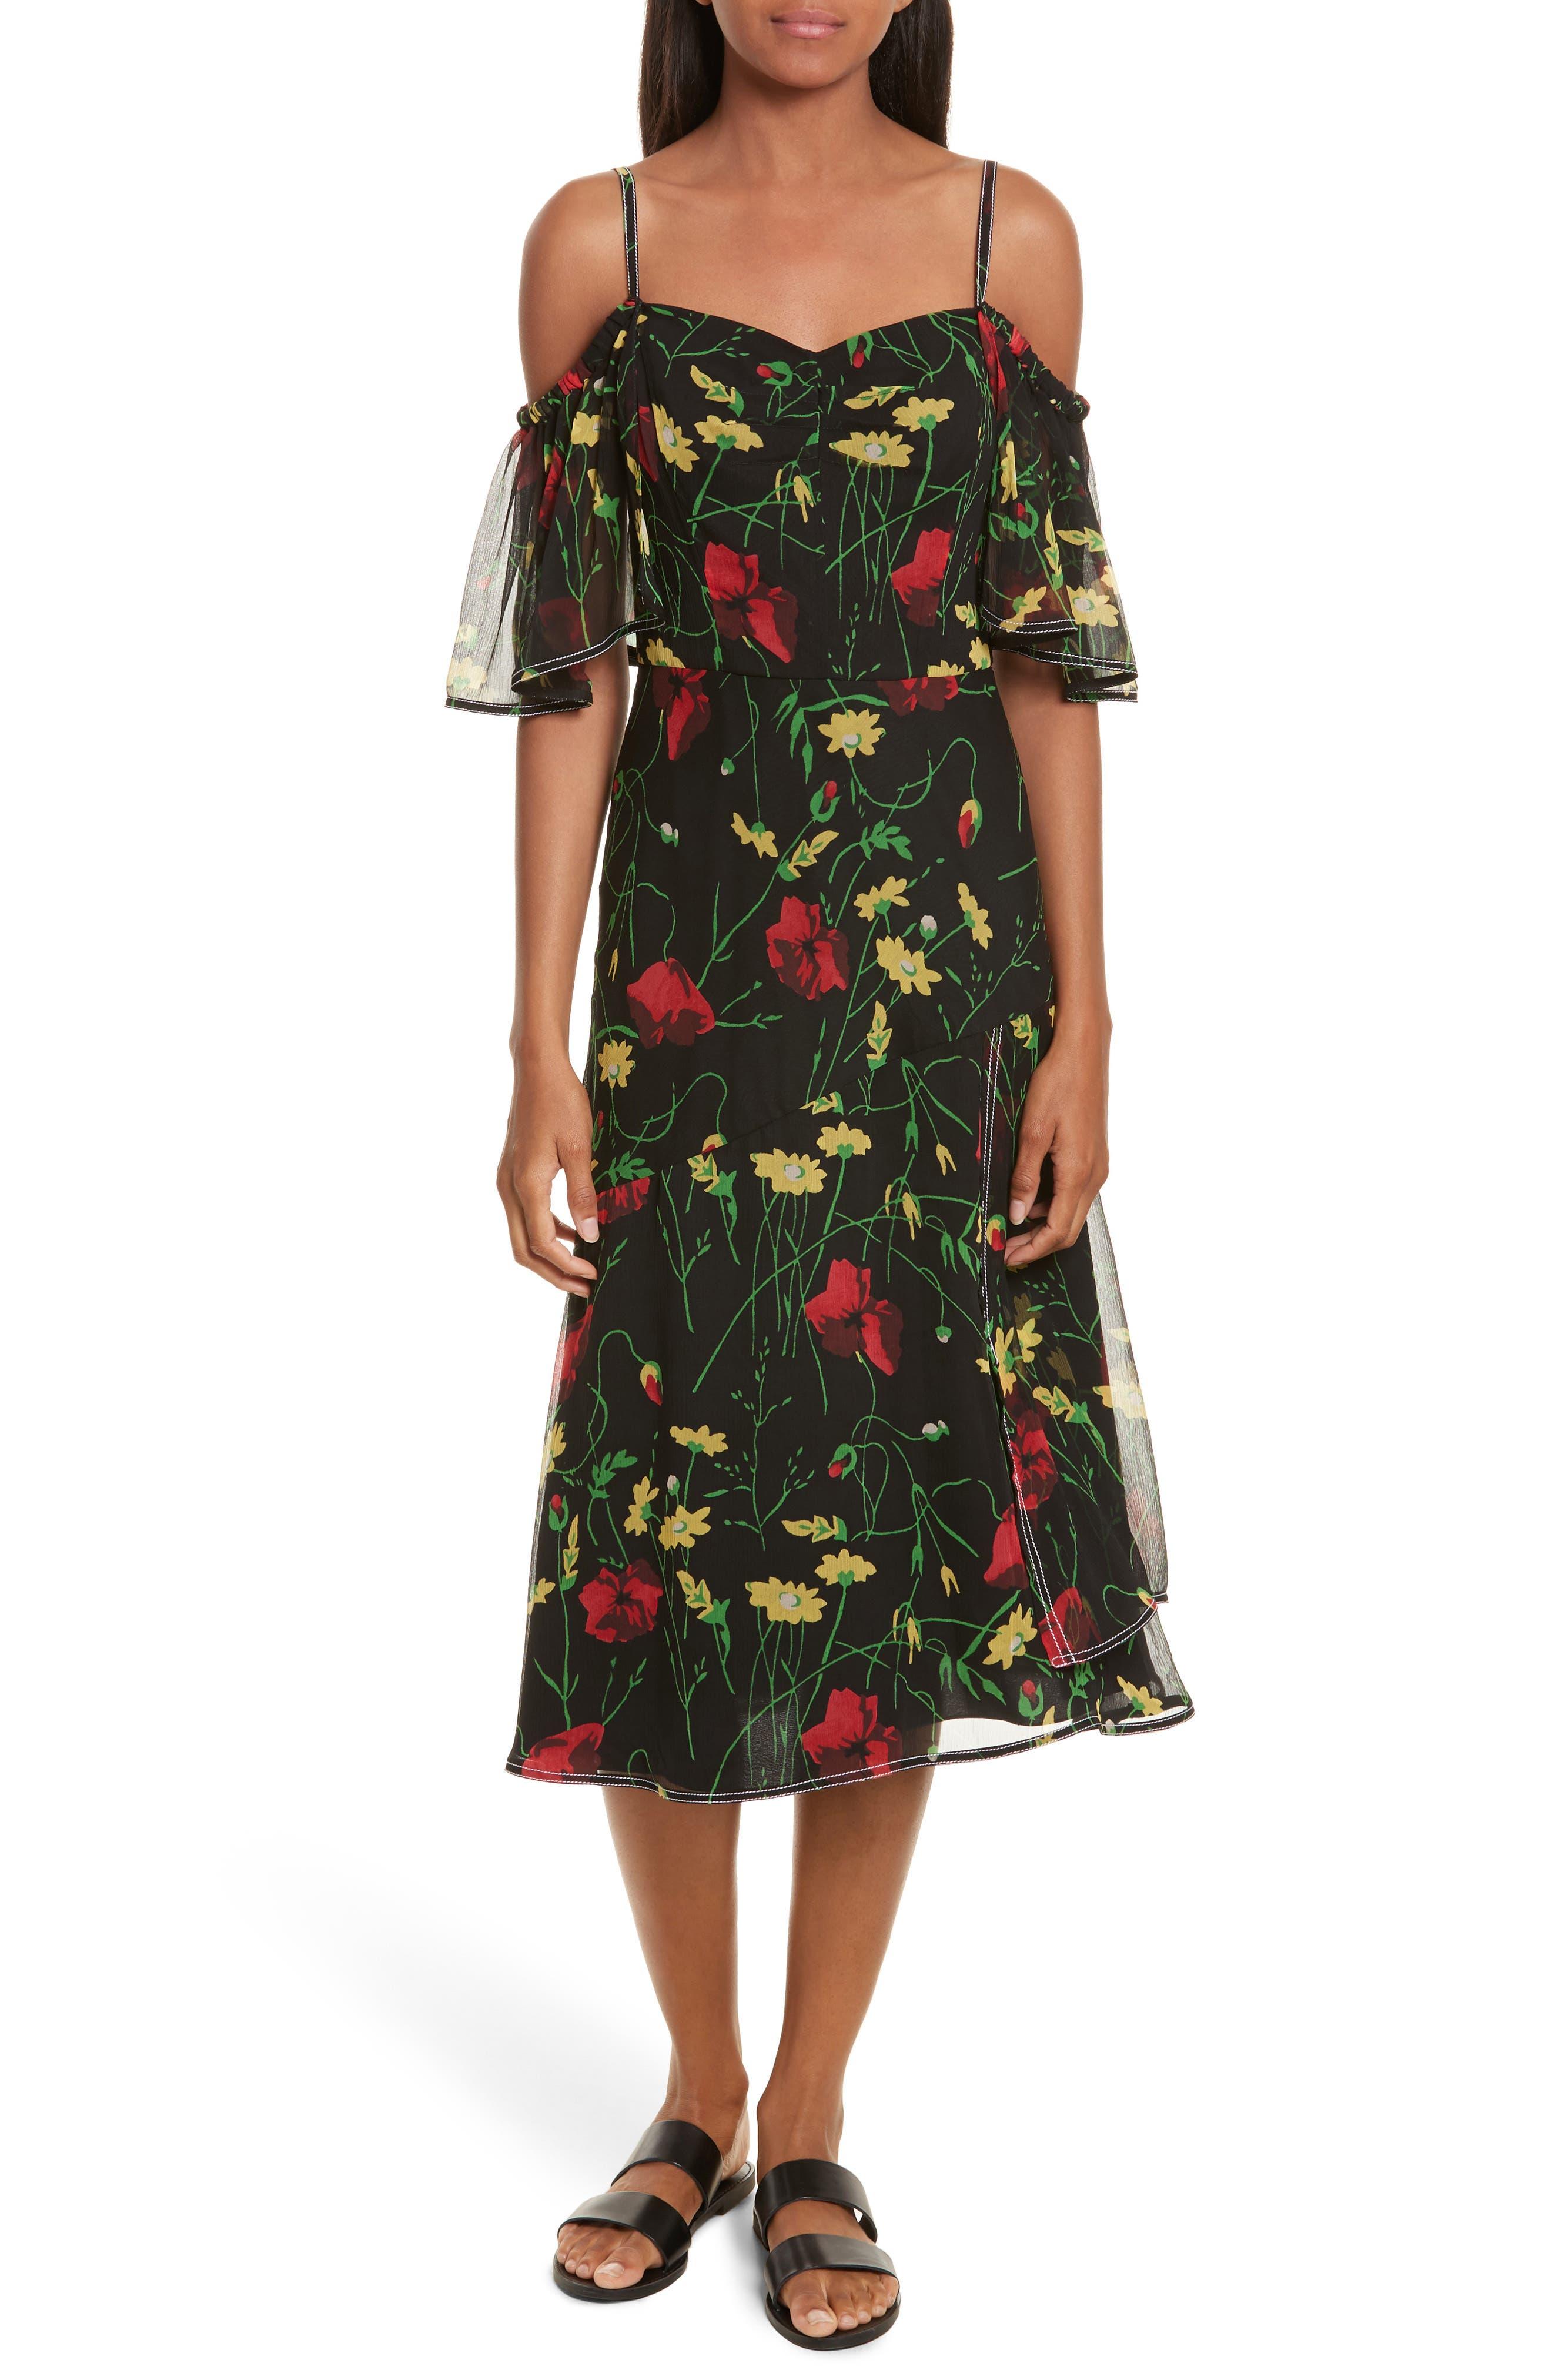 Alternate Image 1 Selected - GREY Jason Wu Print Chiffon Off the Shoulder Dress